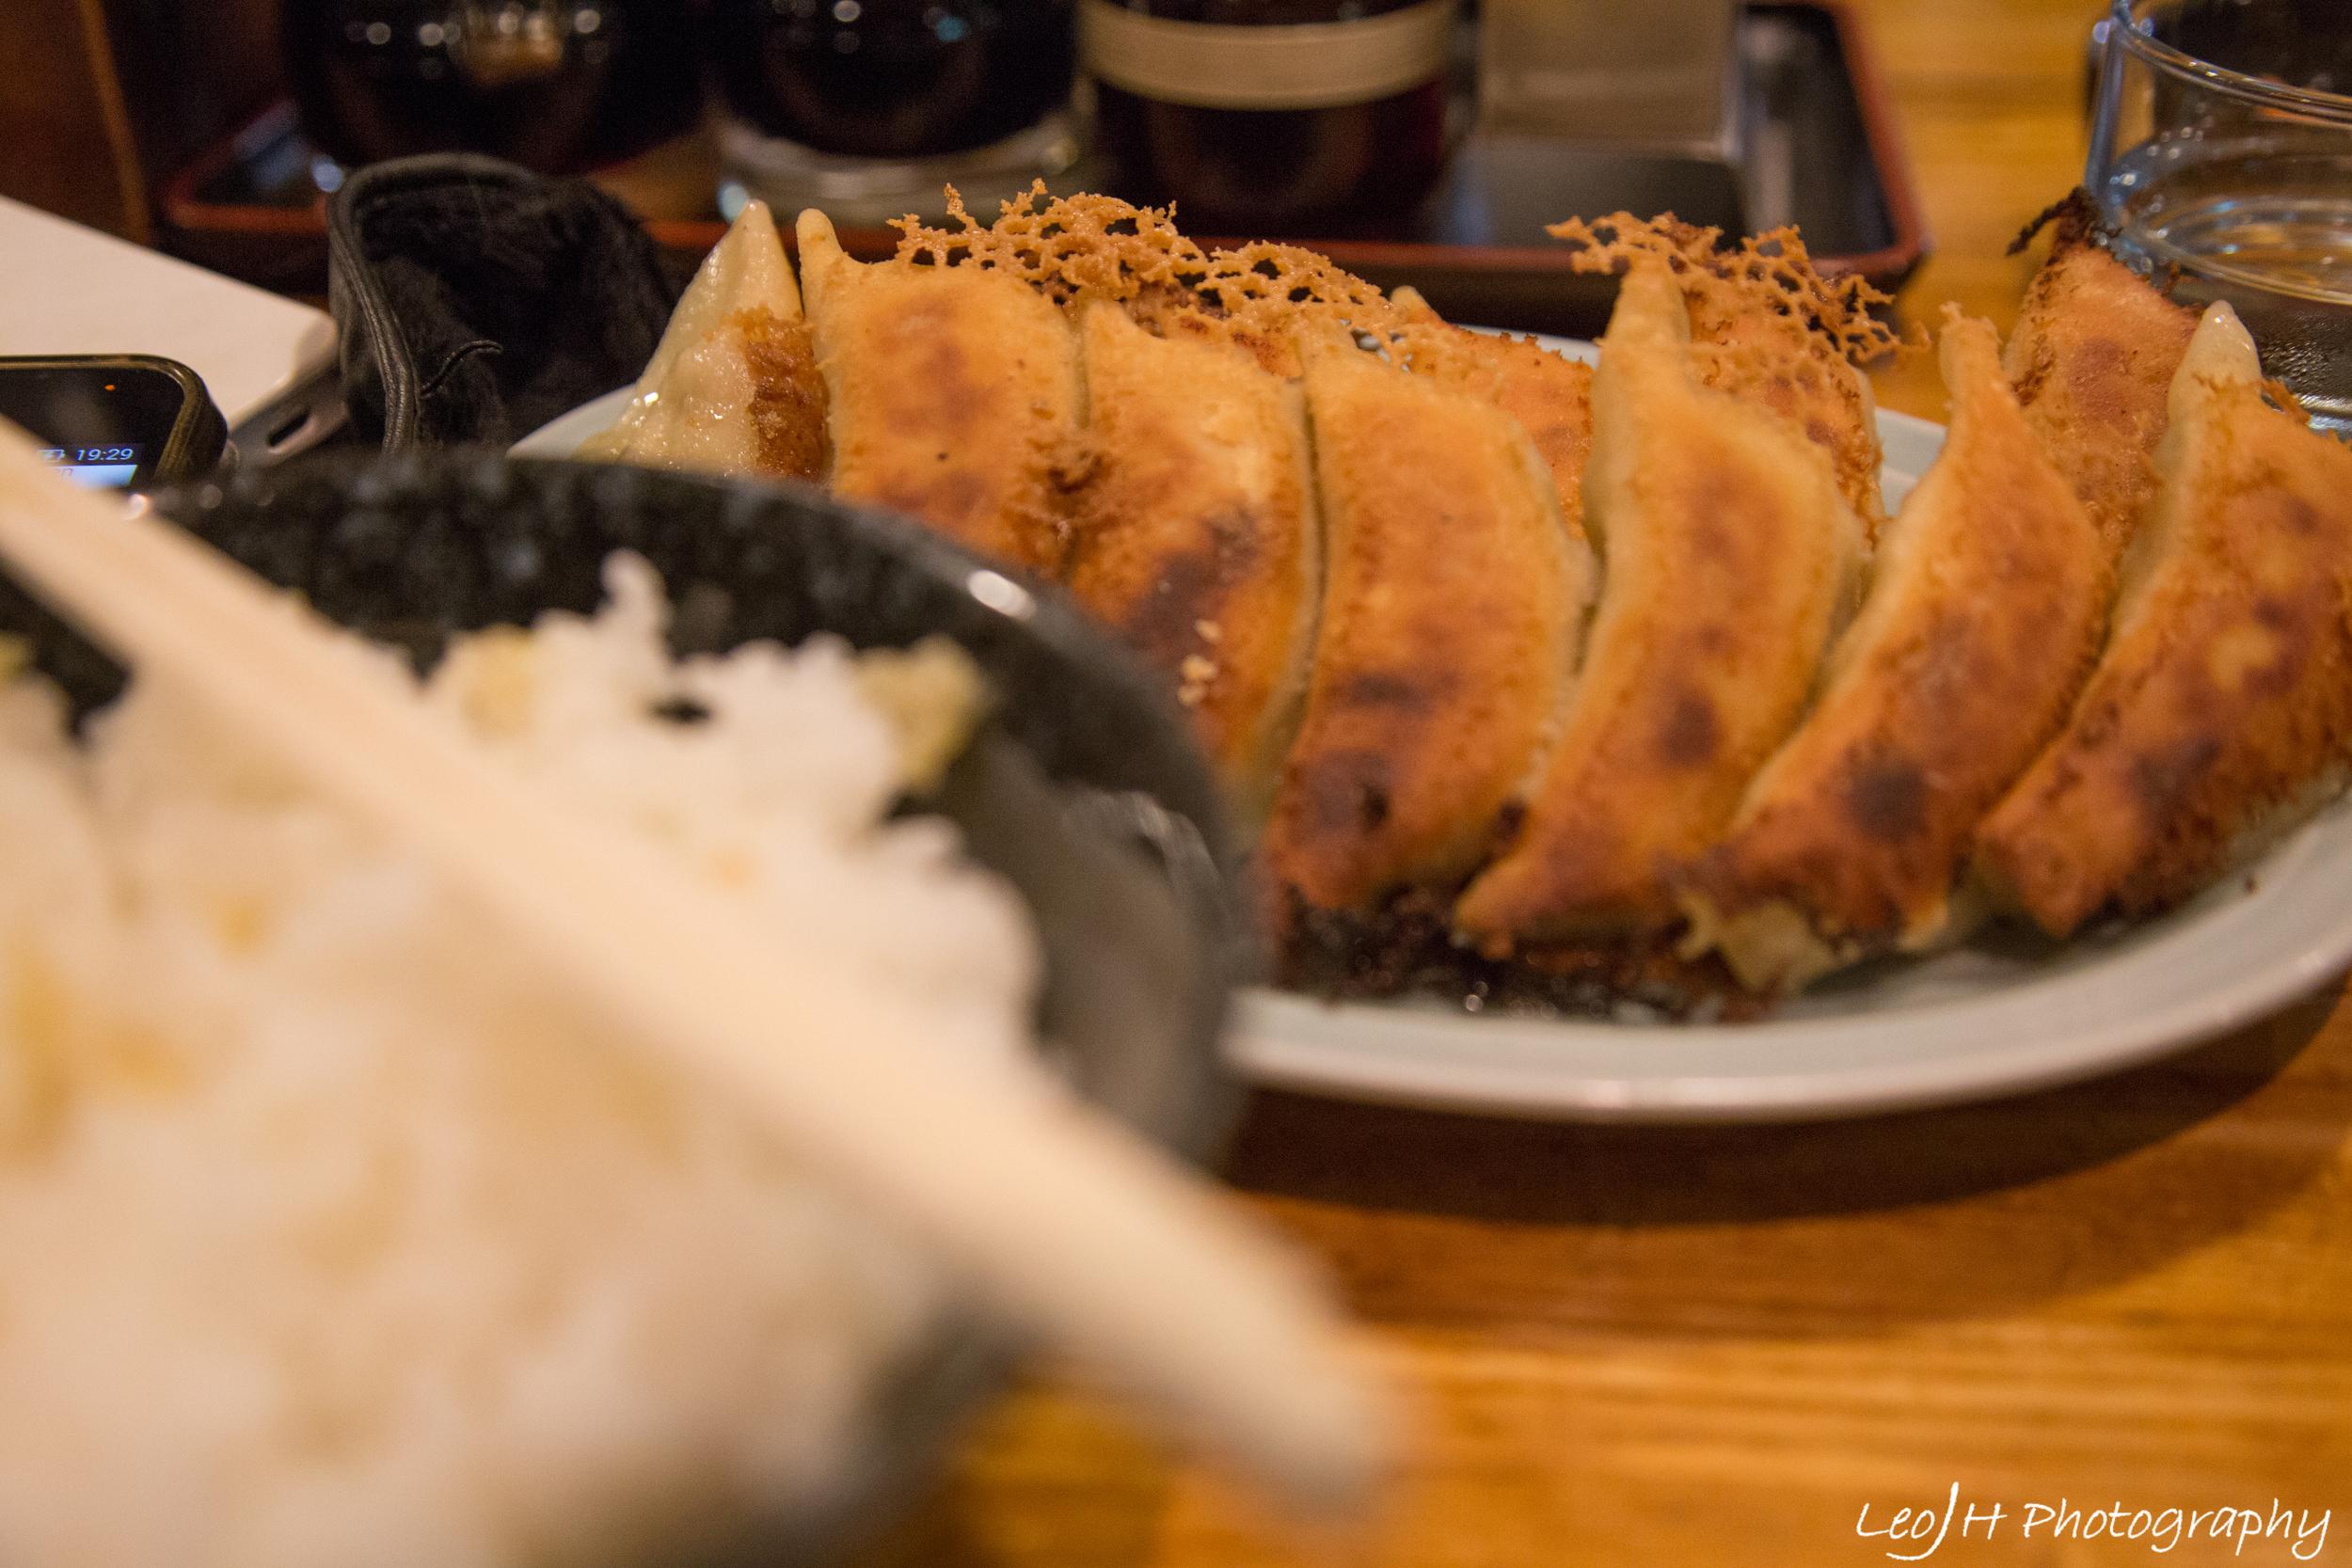 Day 1 dinner: Gyozas at Gyoza Central